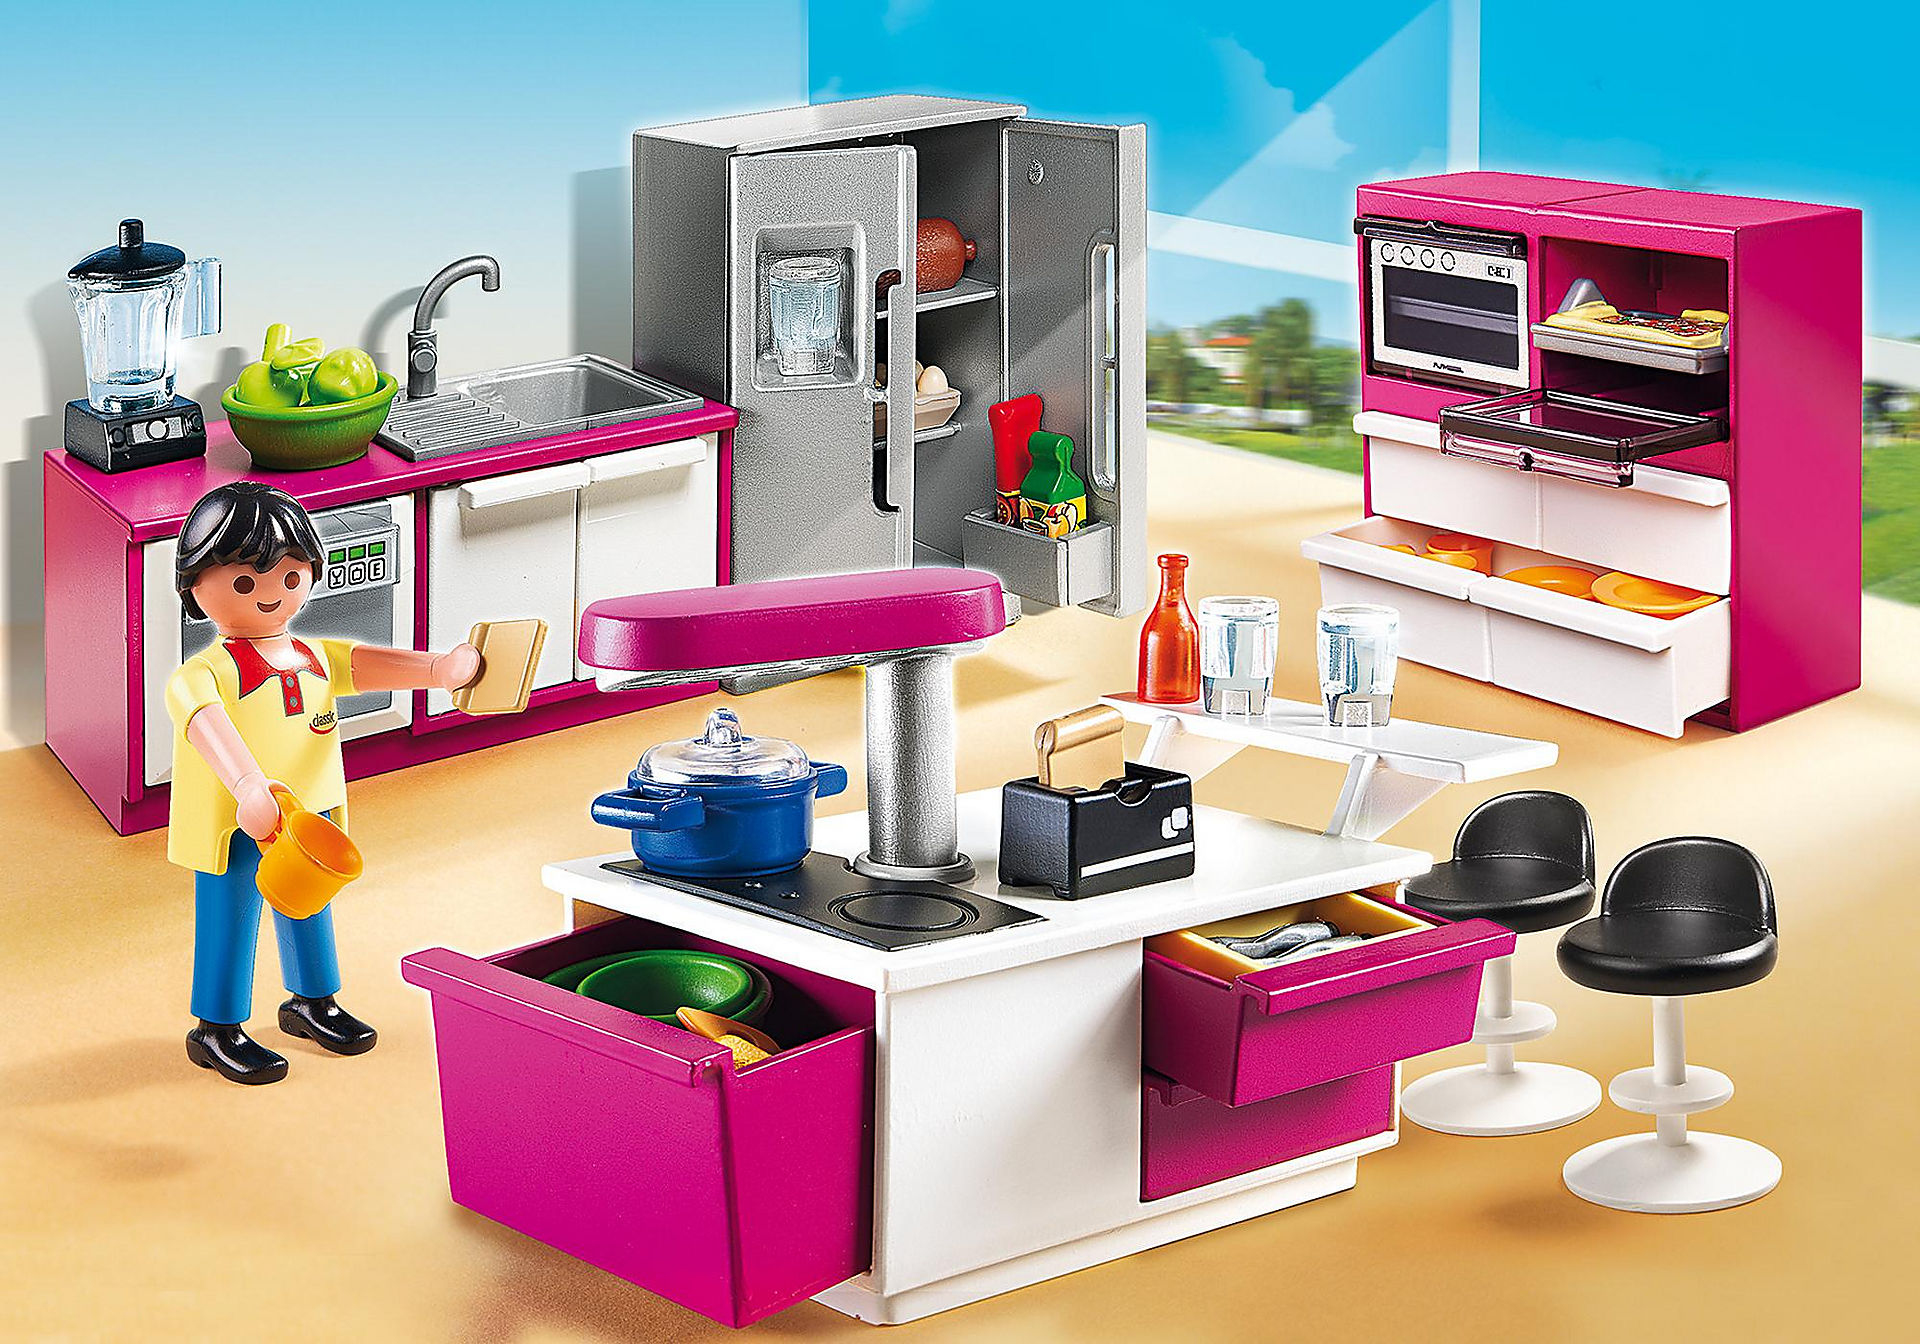 http://media.playmobil.com/i/playmobil/5582_product_detail/Keuken met kookeiland